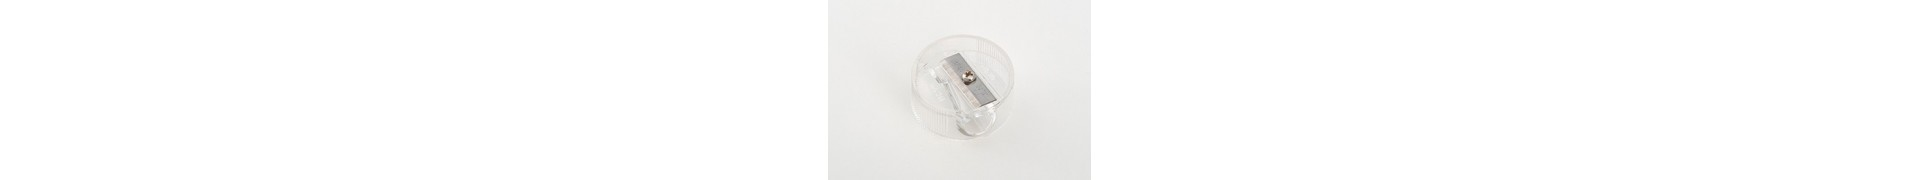 Taille-crayon NJK 511 - Transparent (Double) Rond